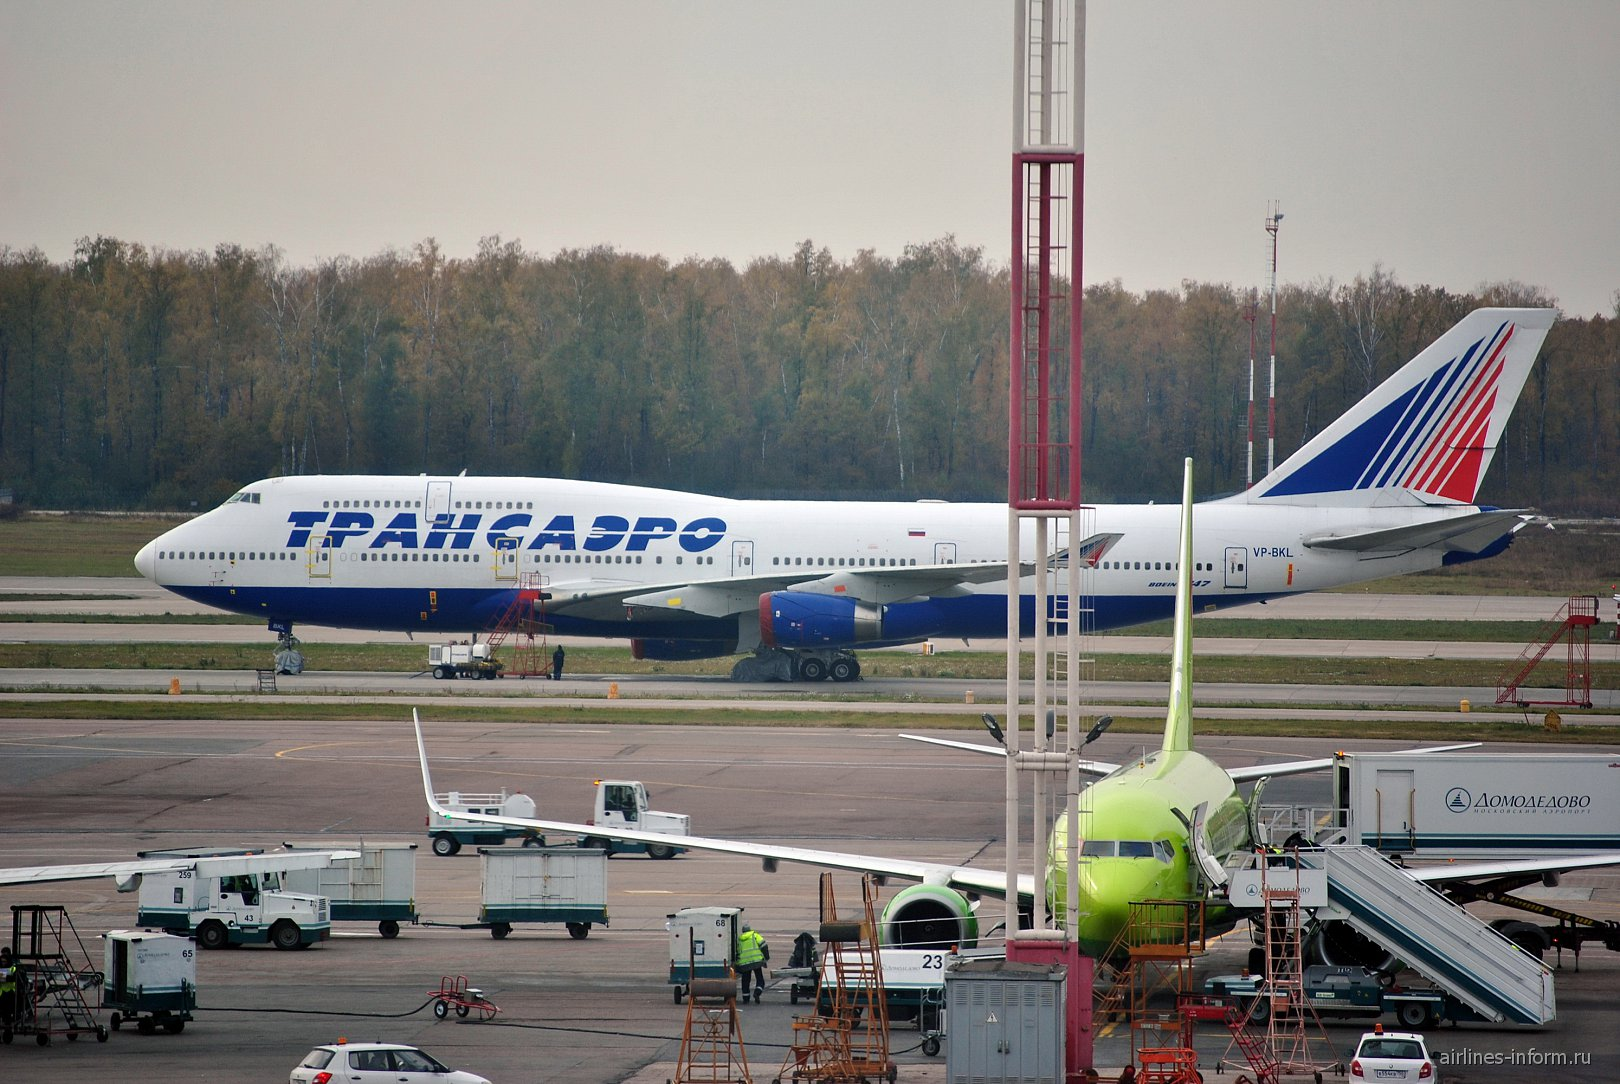 Самолет Боинг-747-400 VP-BKL авиакомпании Трансаэро в аэропорту Домодедово